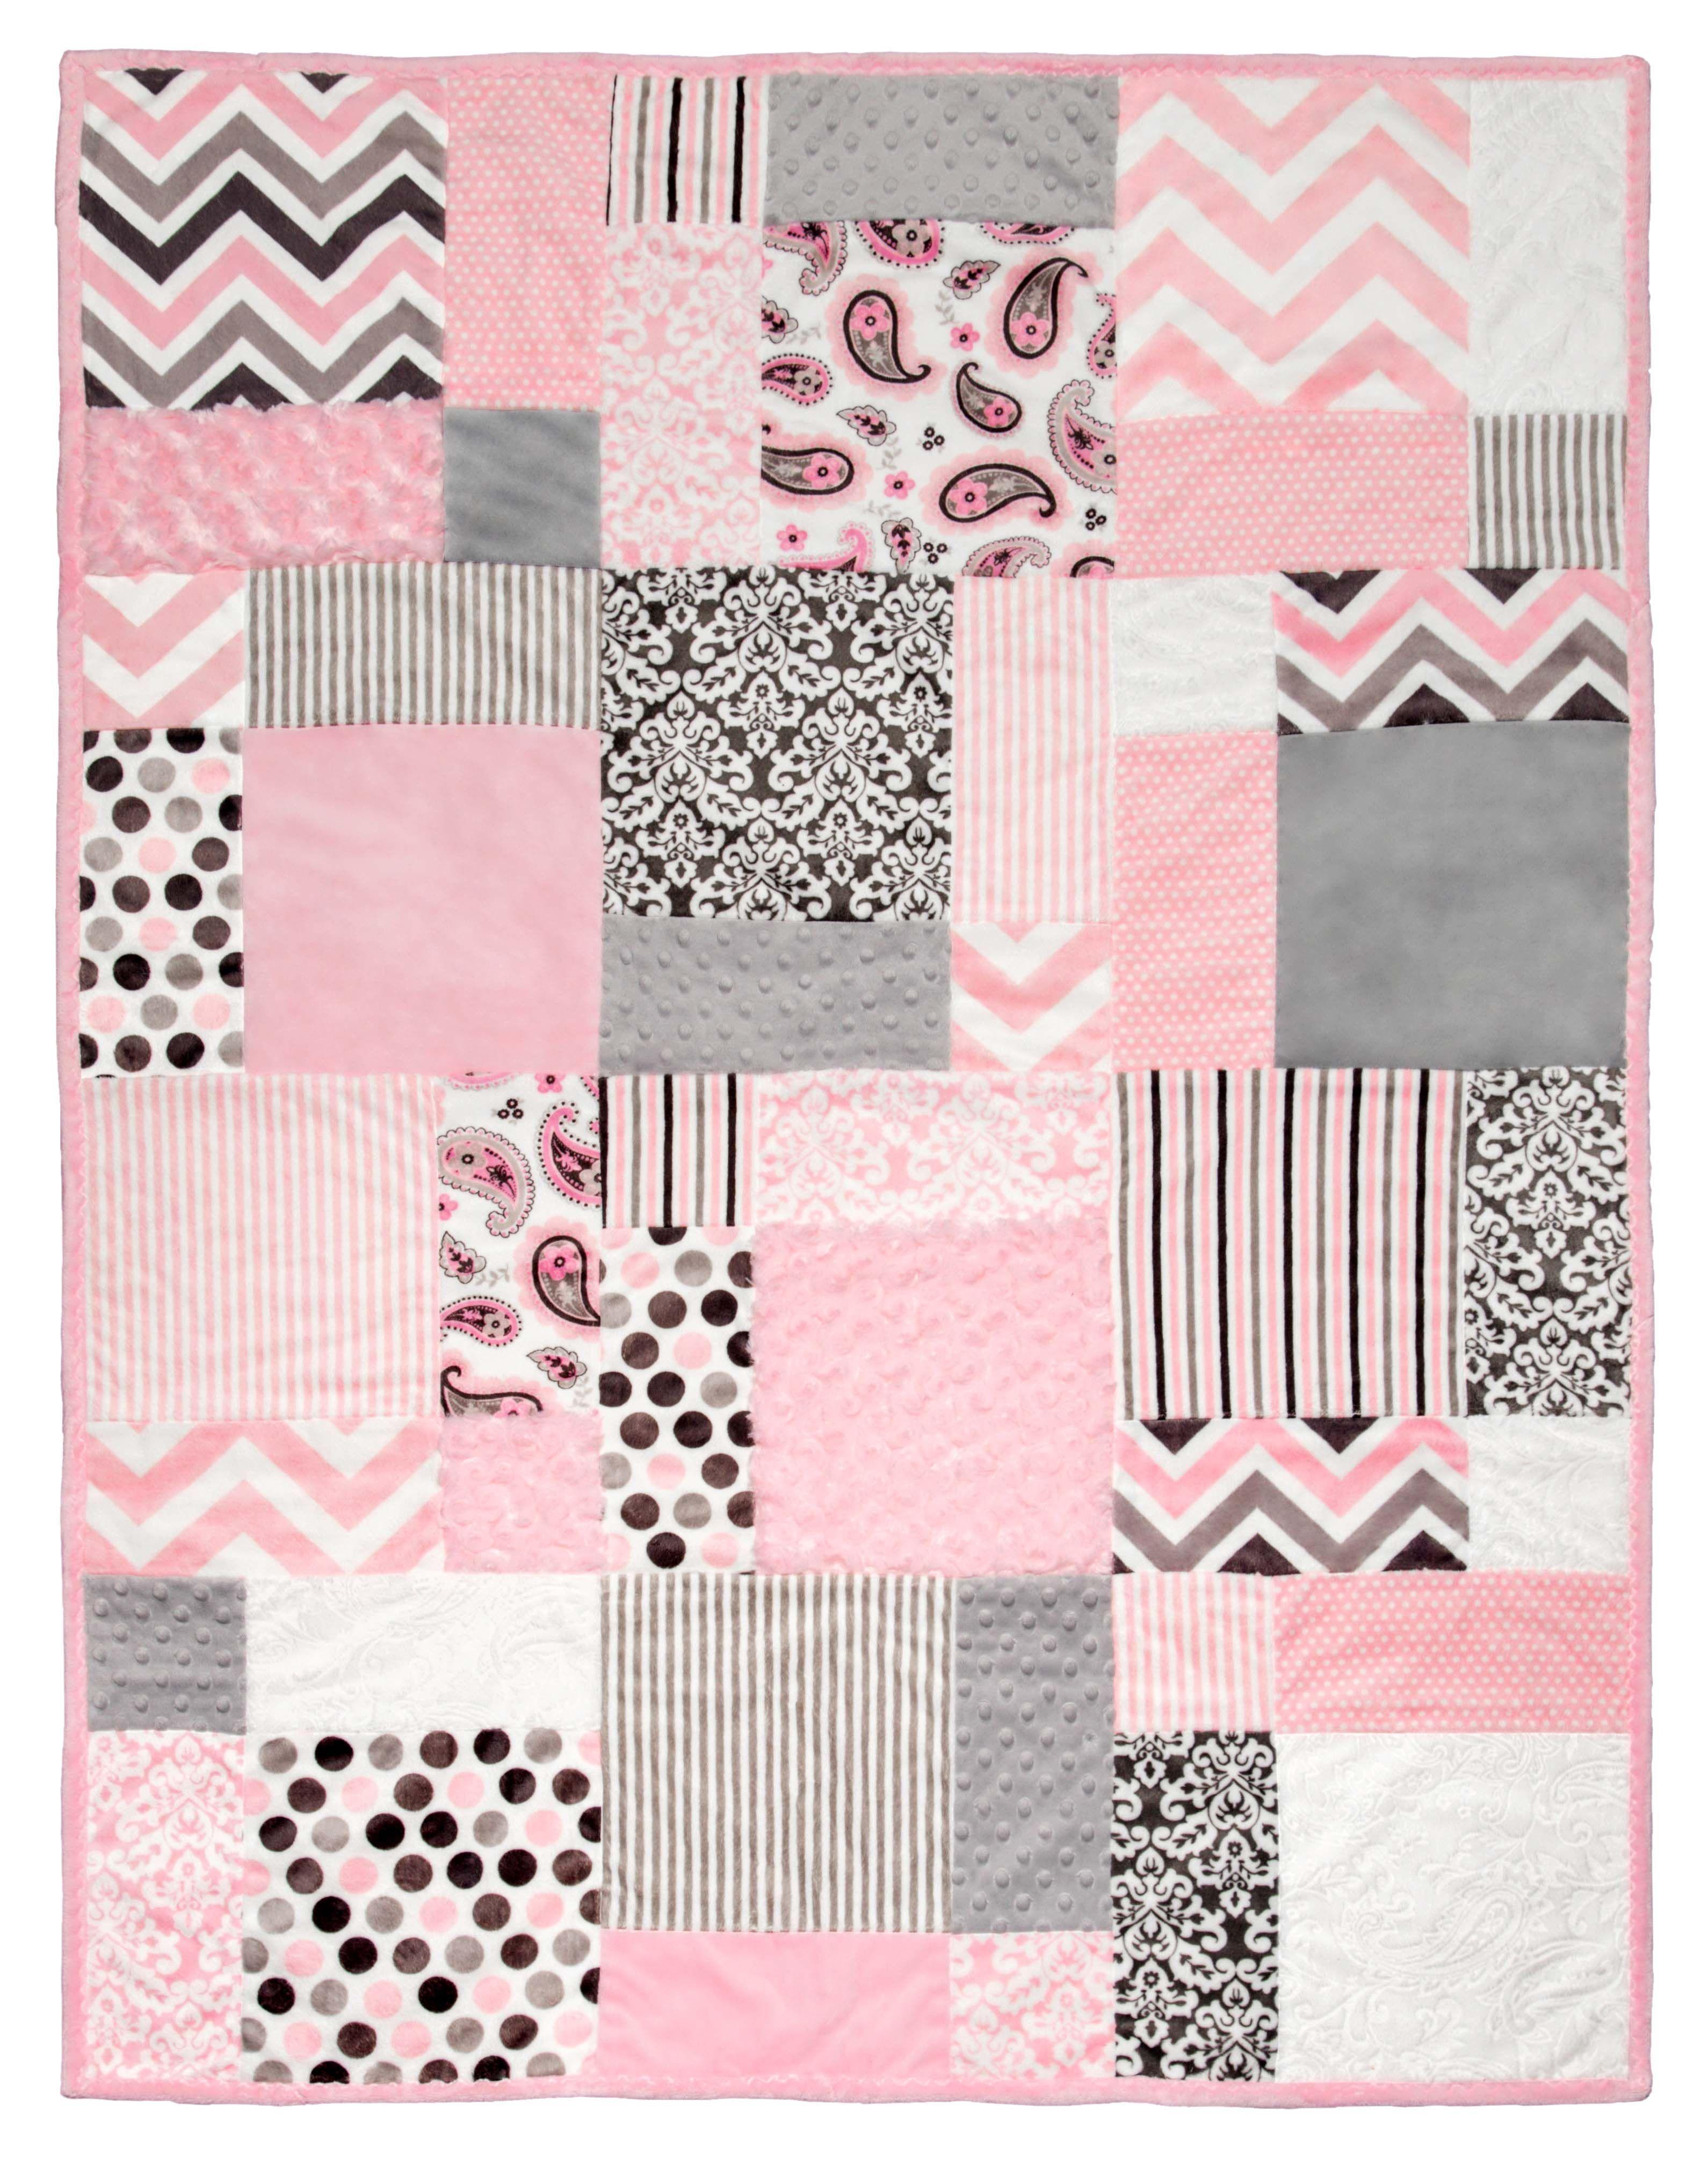 Free quilt pattern (